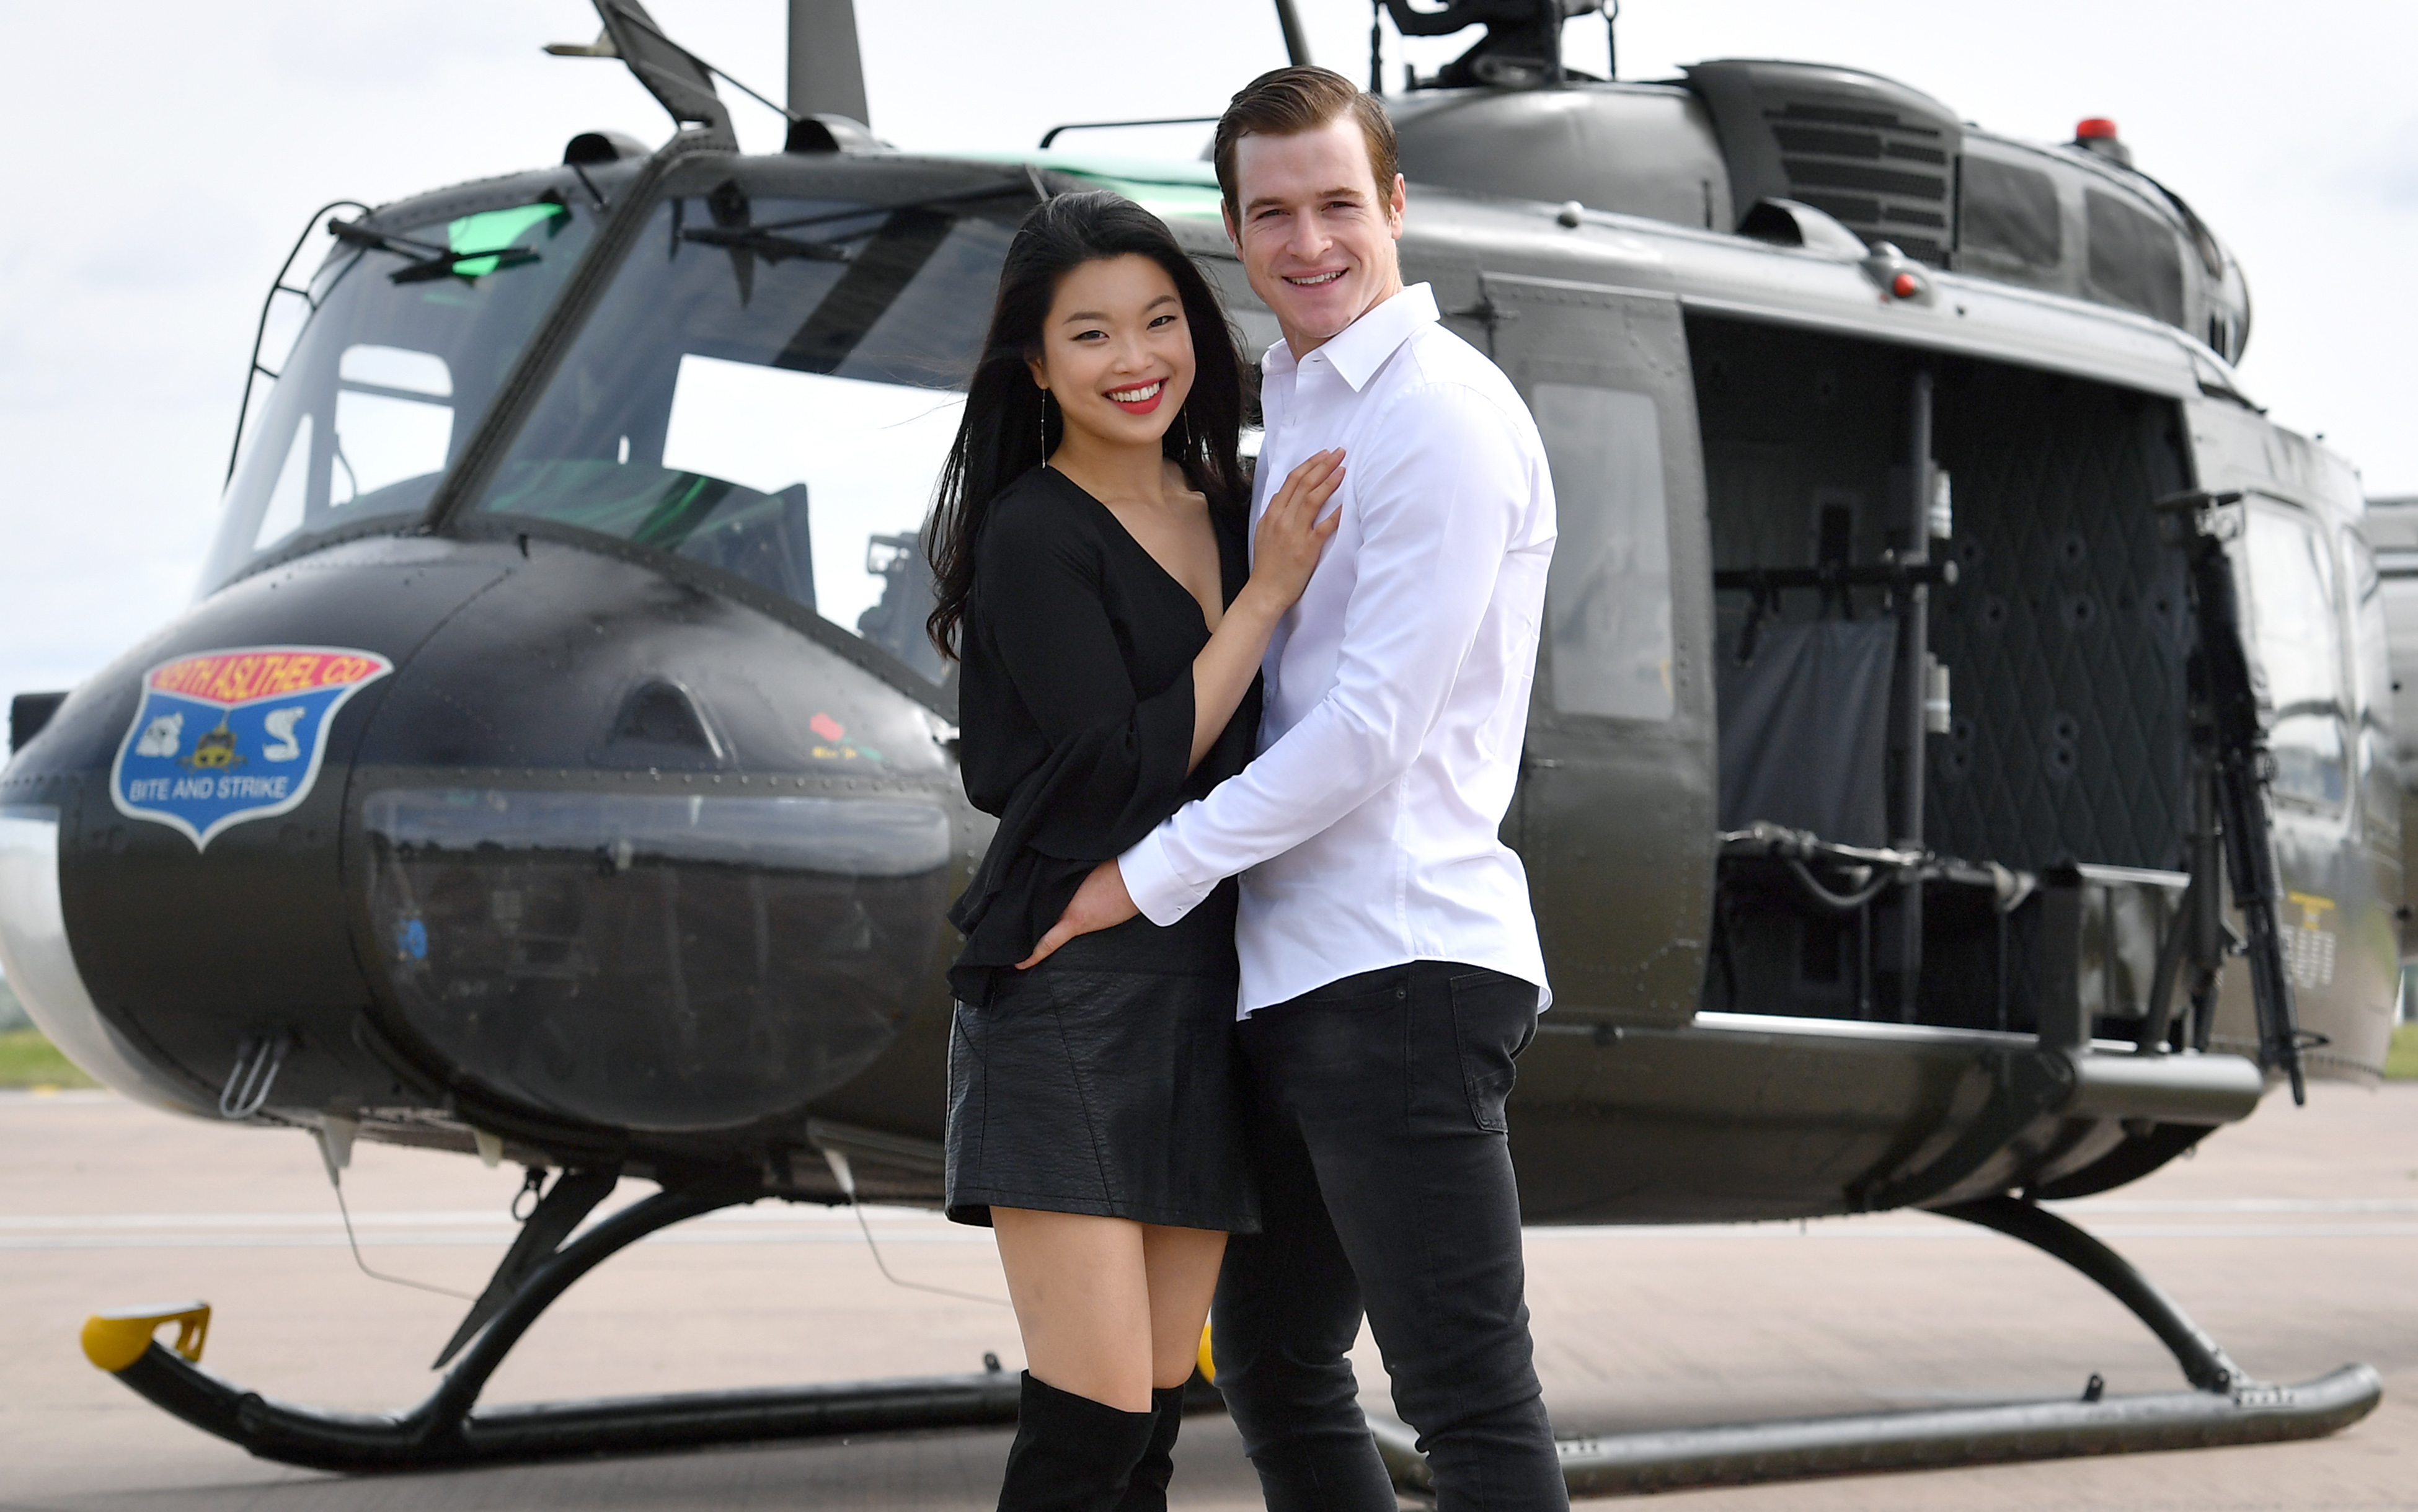 Stars of Miss Saigon enjoy up-close encounter with Vietnam veteran 'Huey' helicopter. - Birmingham Hippodrome